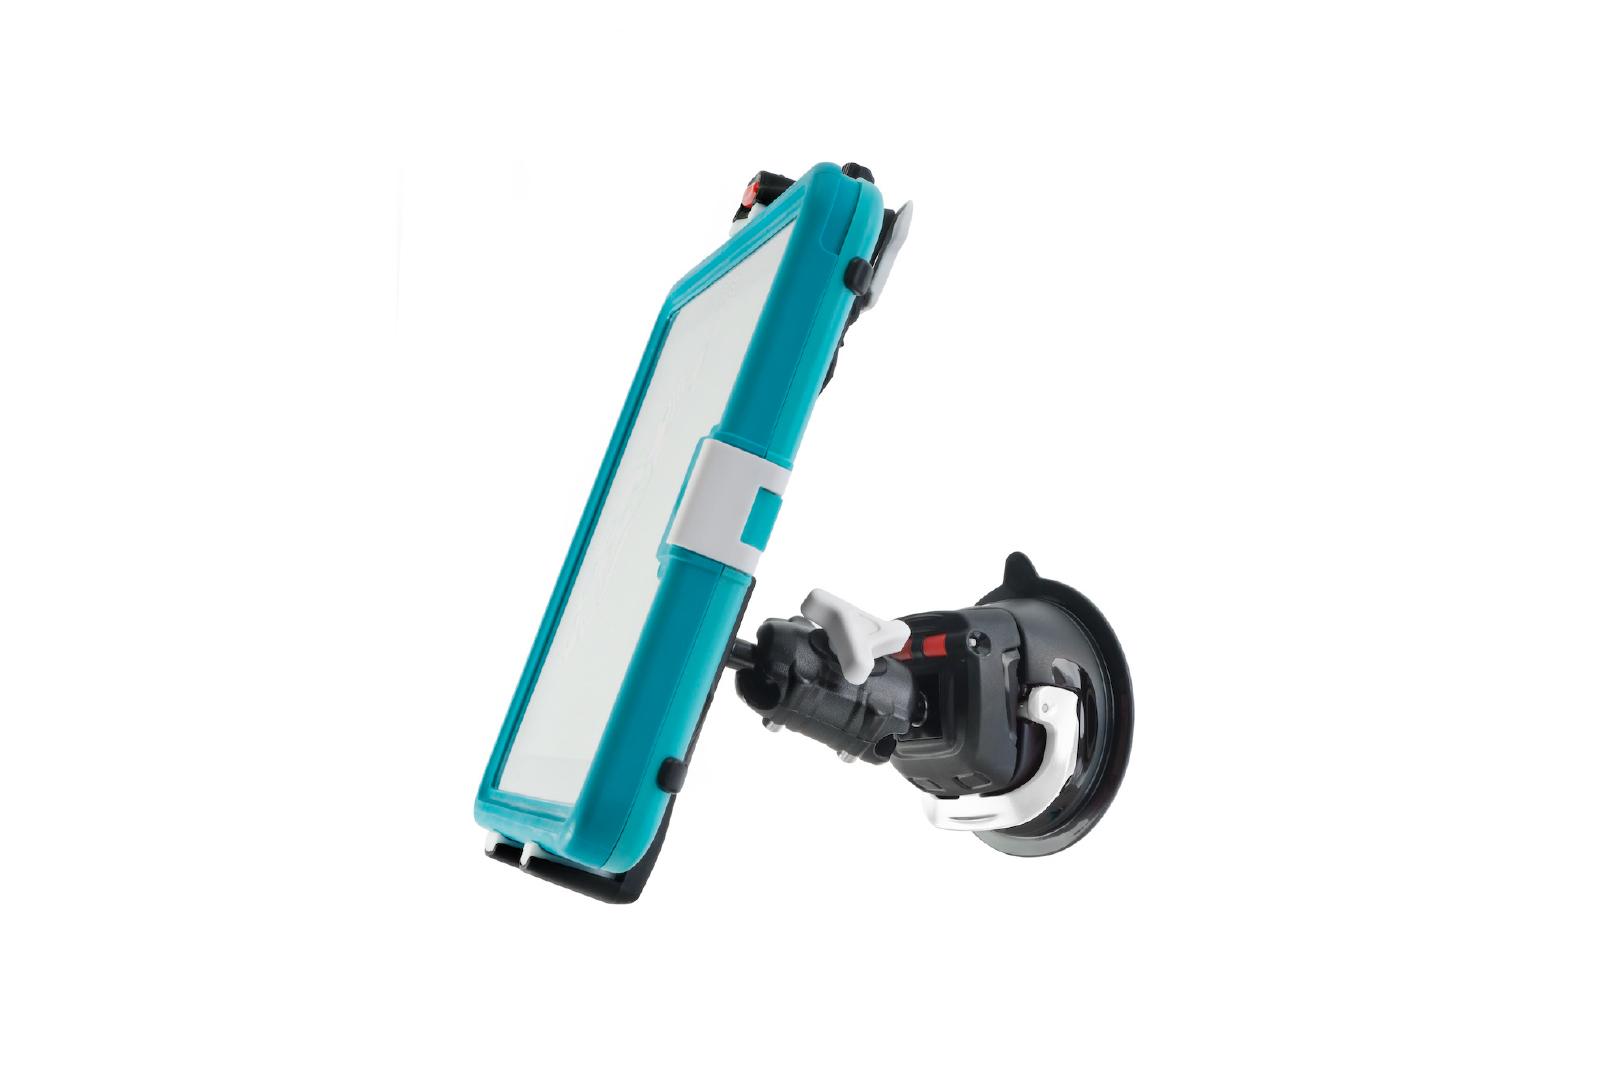 Scanstrut Tablet-Halter ROKK Mini bei Tigerexped.